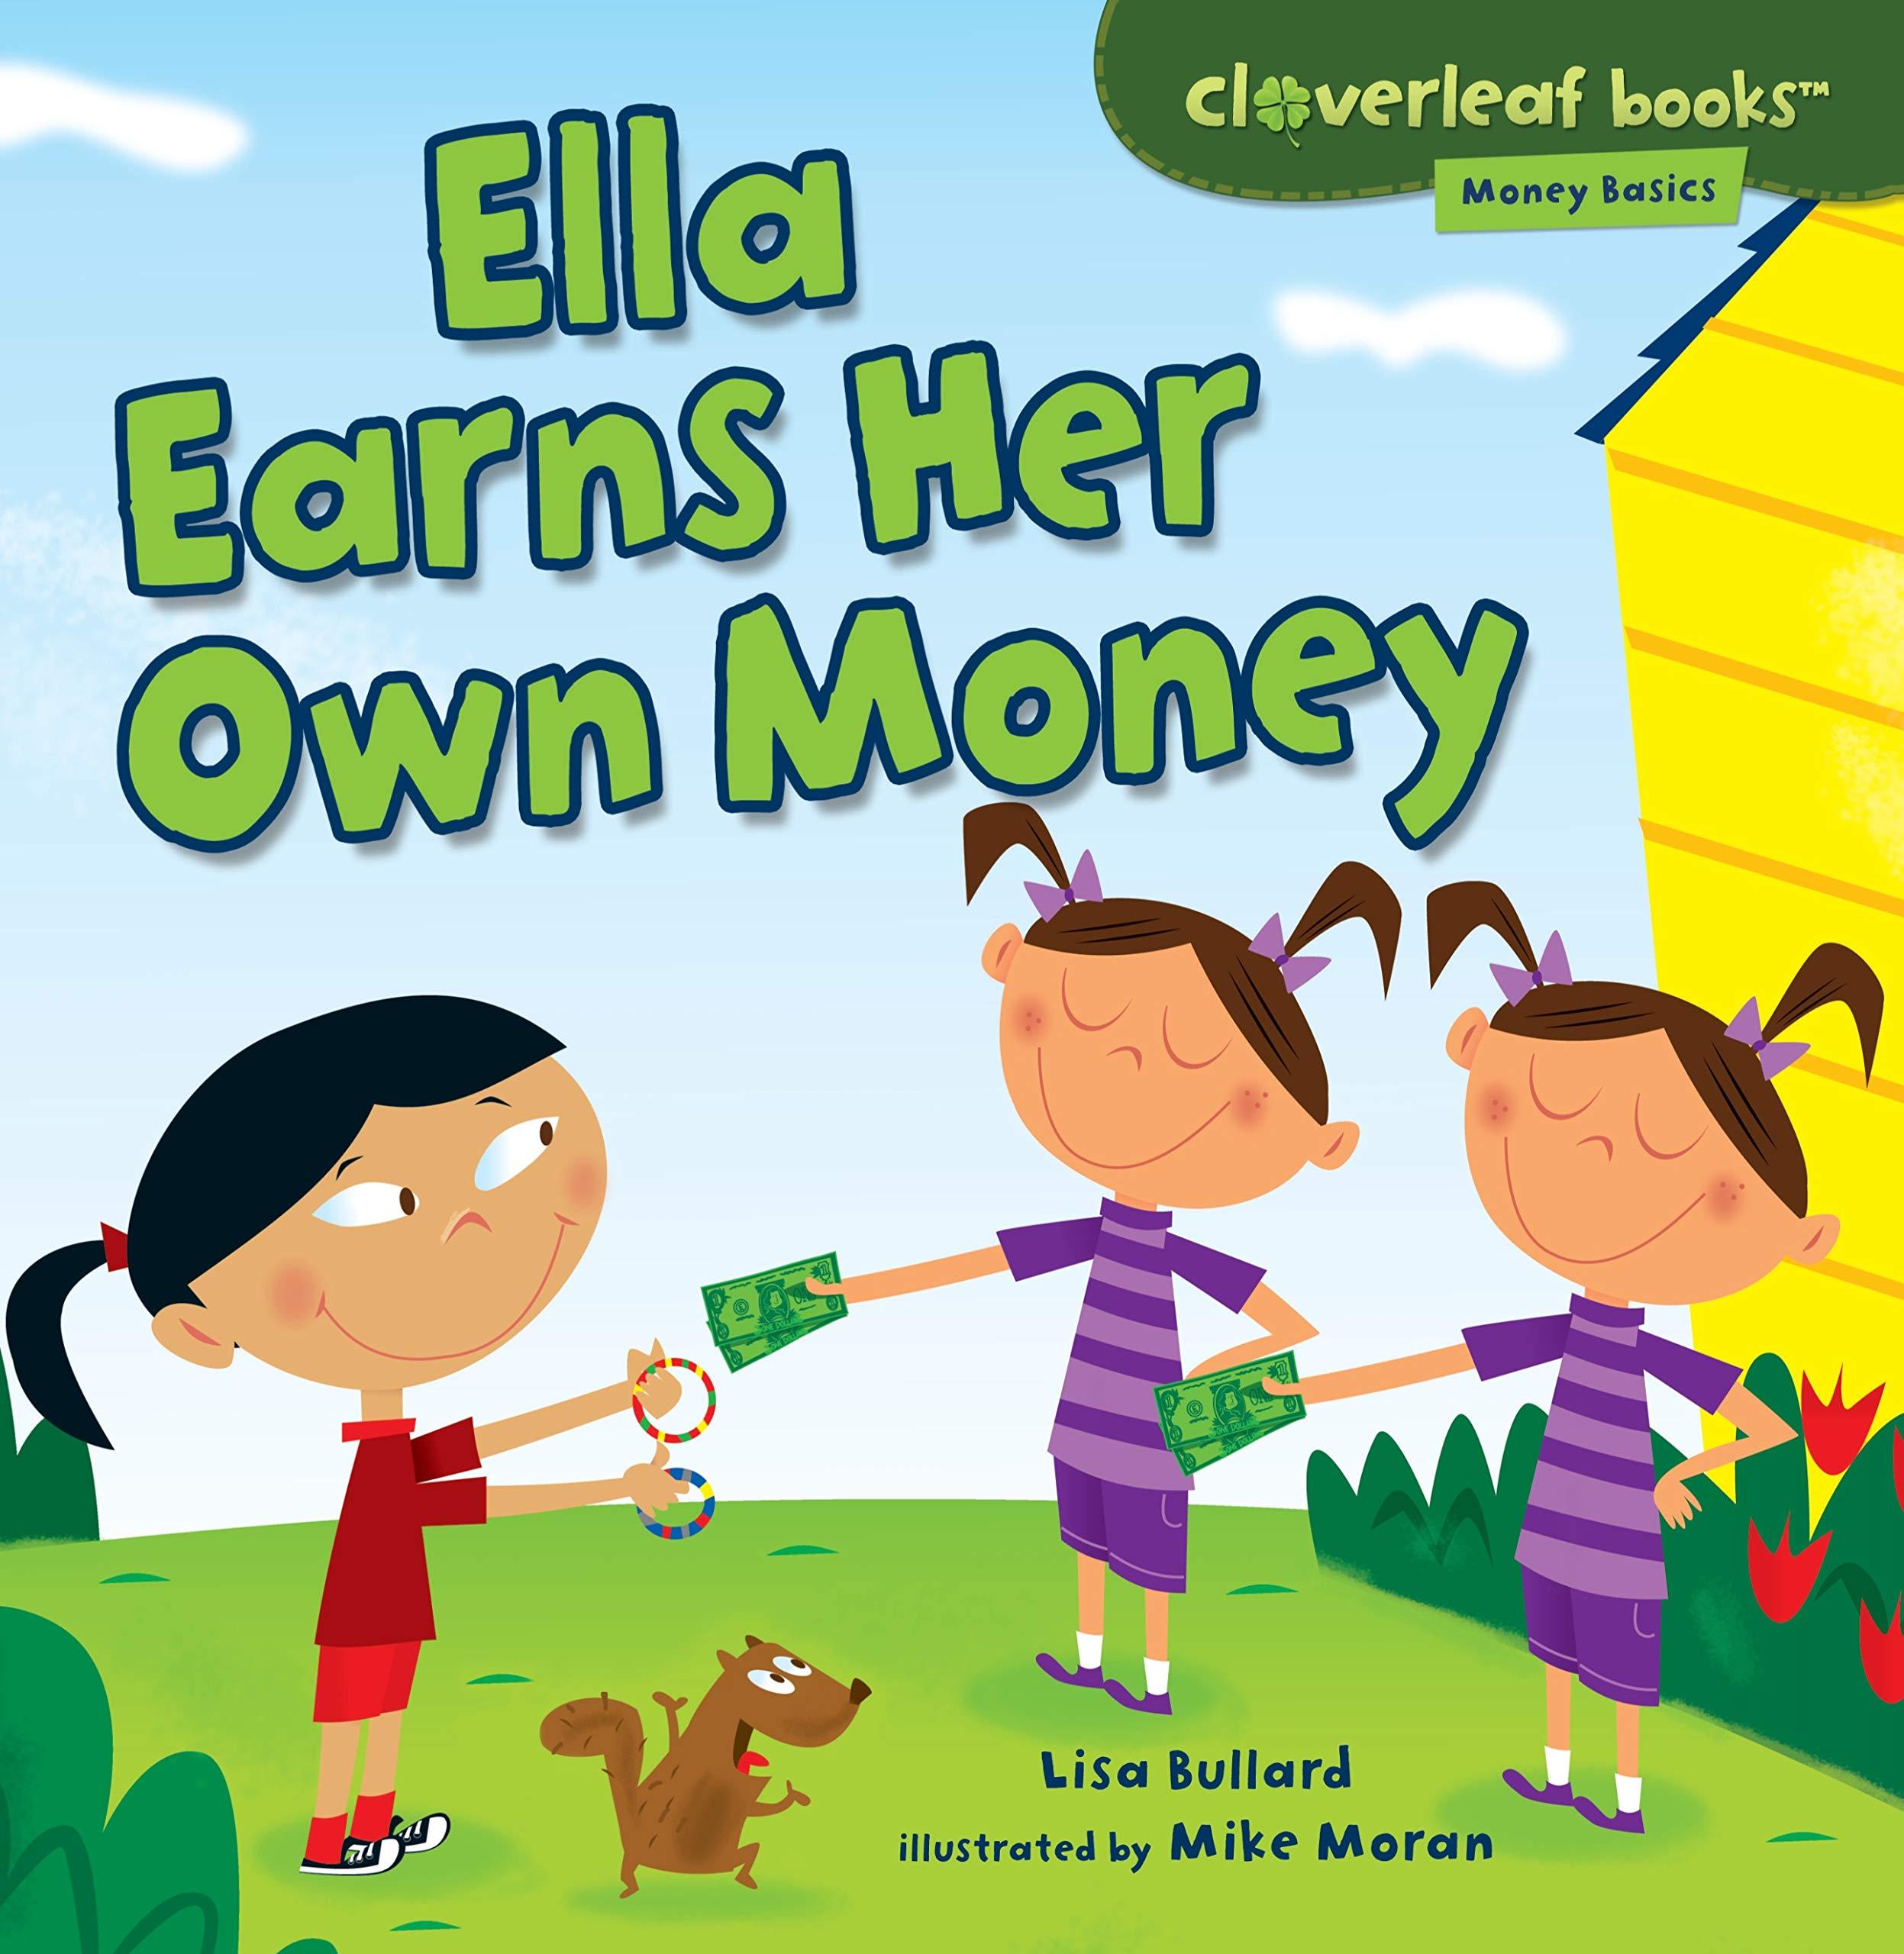 Image result for ella earns her own money